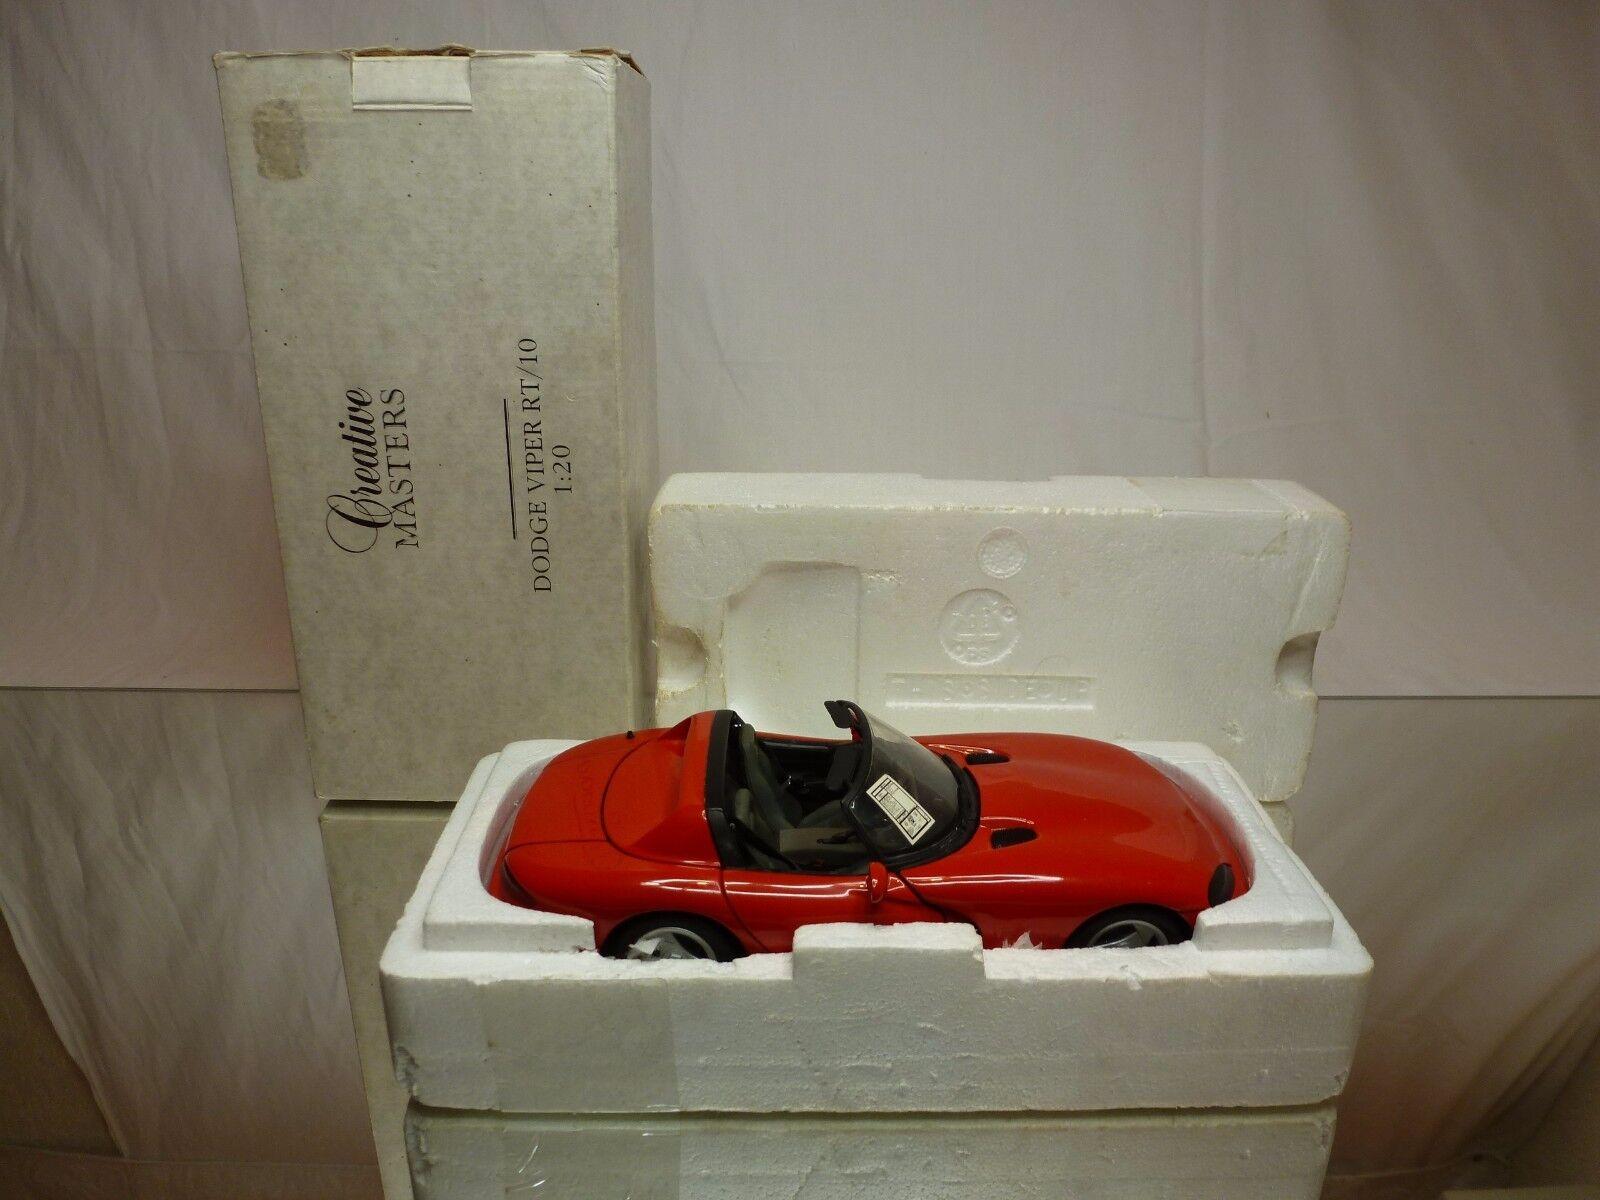 CREATIVE MASTERS 8672 DODGE VIPER RT 10 - rojo 1 20 - GOOD IN BOX